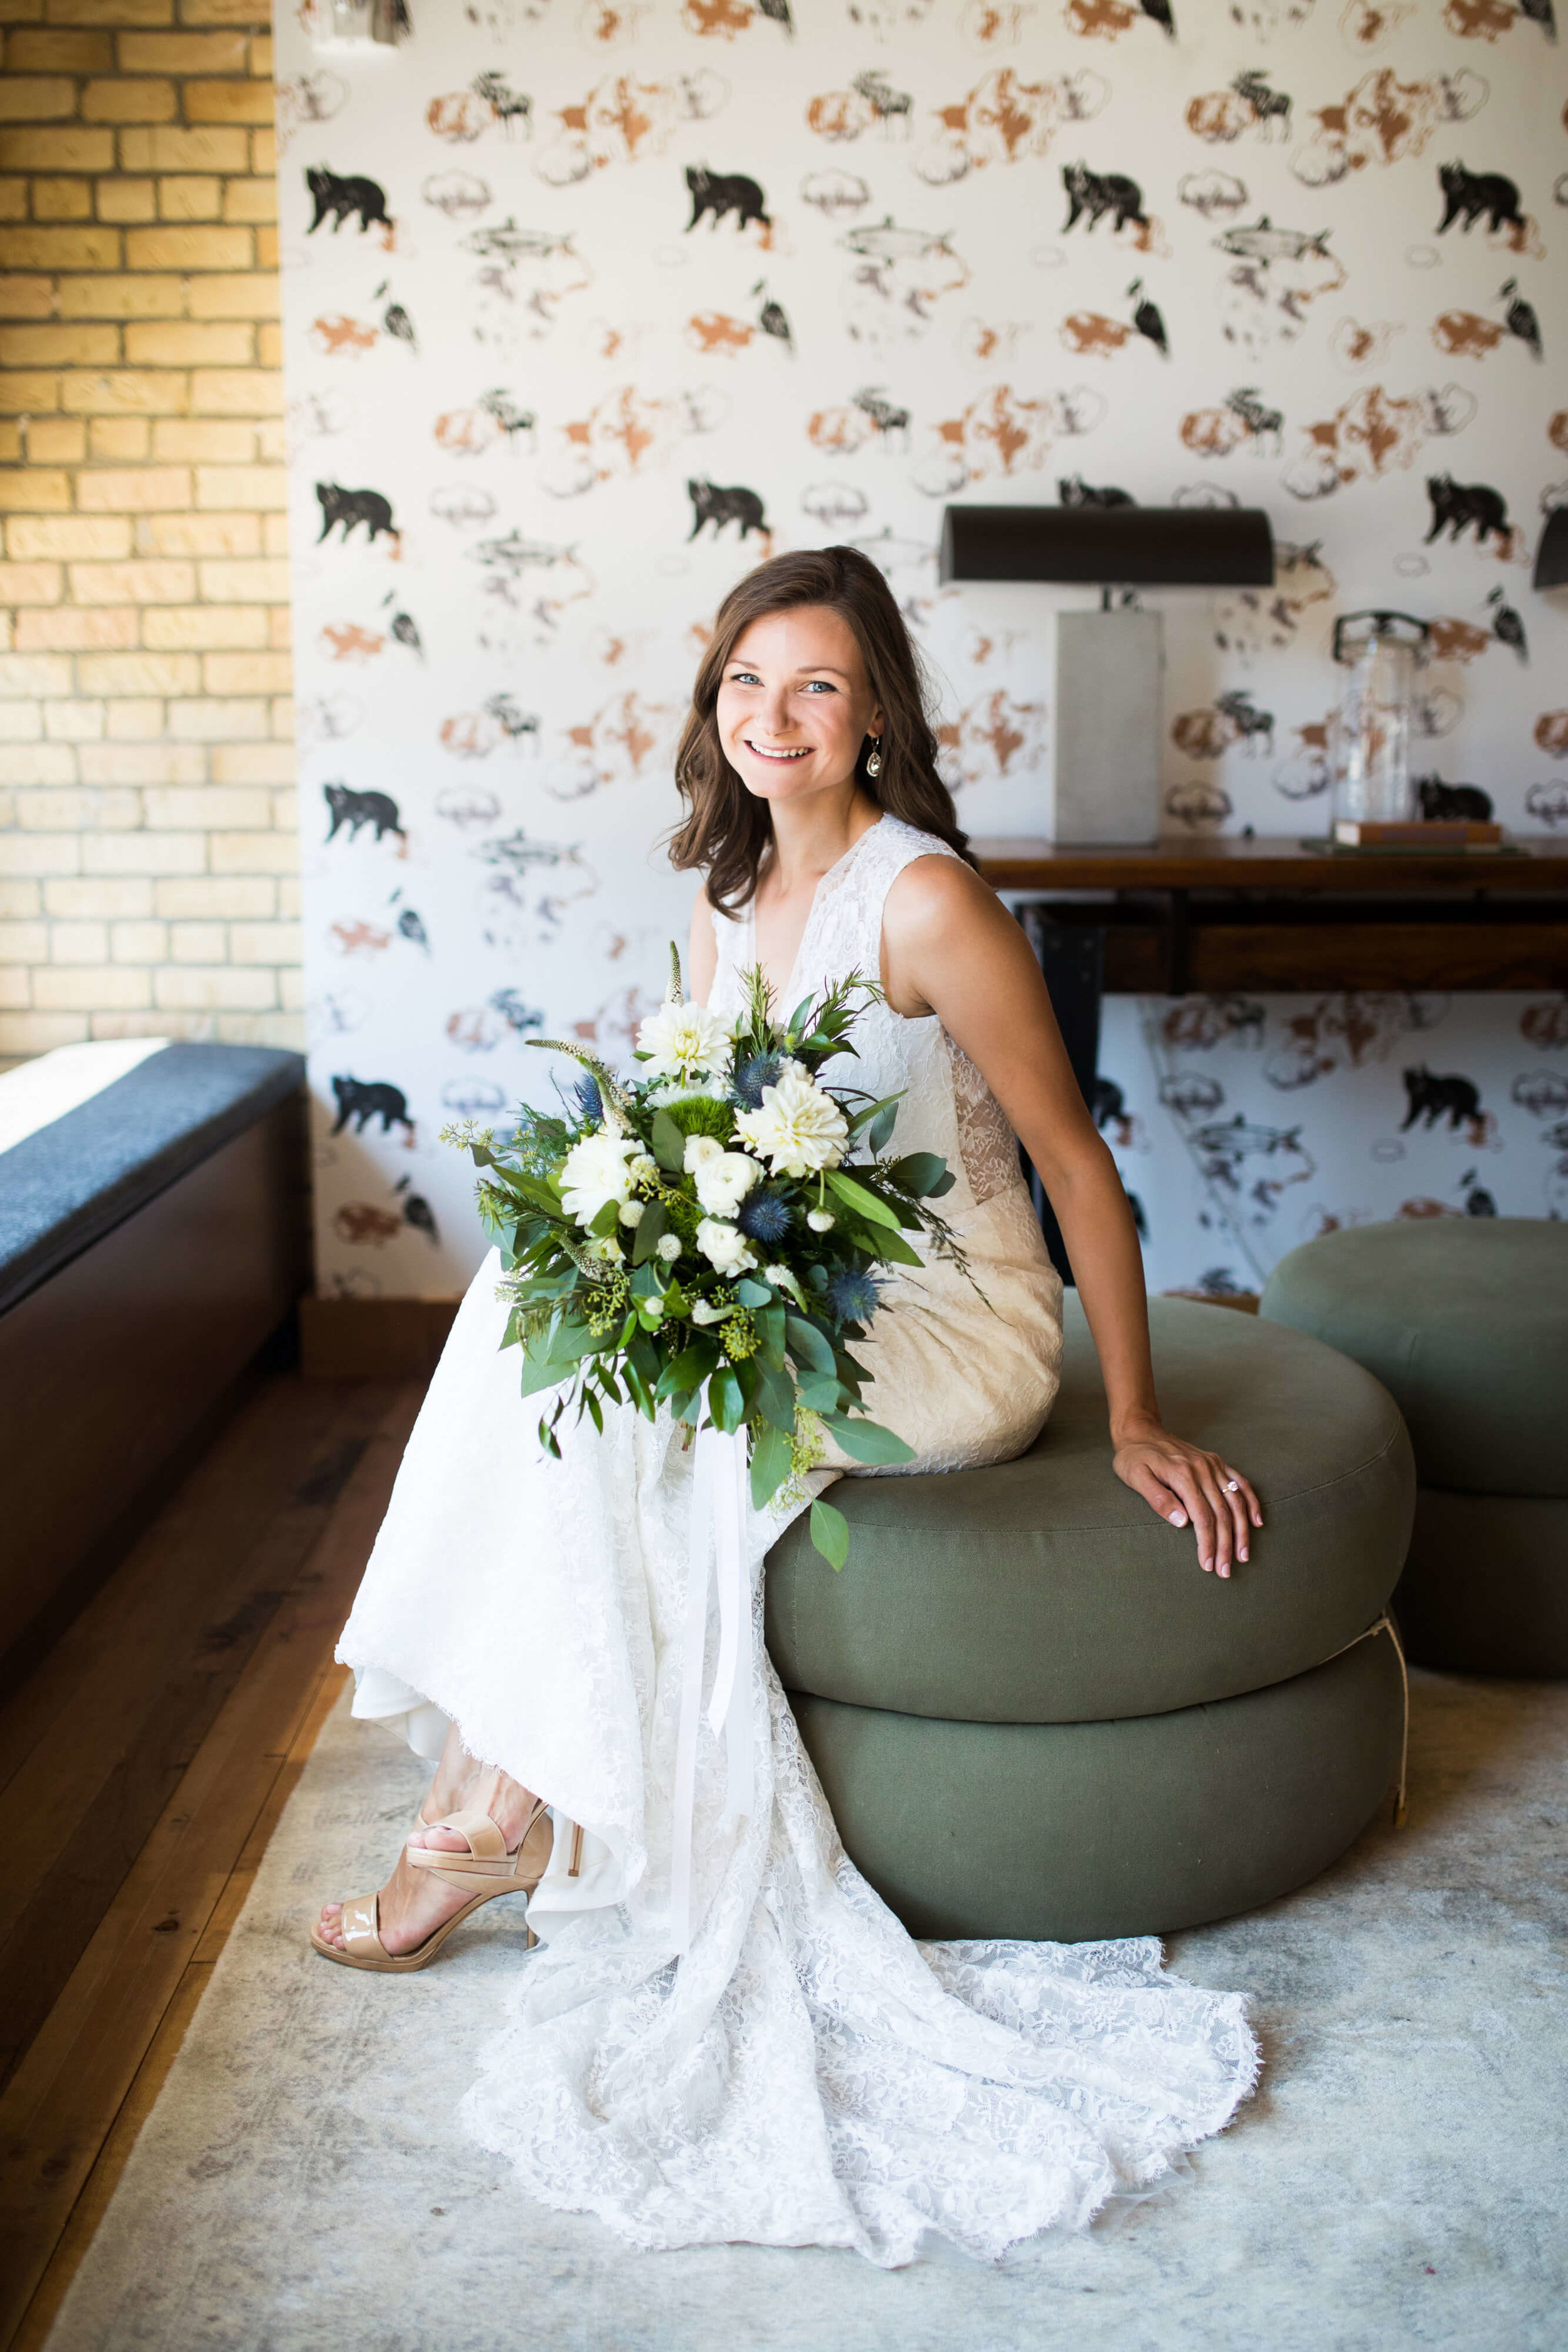 bride sitting on ottoman | Minnesota wedding photographer Studio KH wedding dress details | wedding blog | Sixpence Events 70 Ways to Photograph Your Wedding Dress.jpg